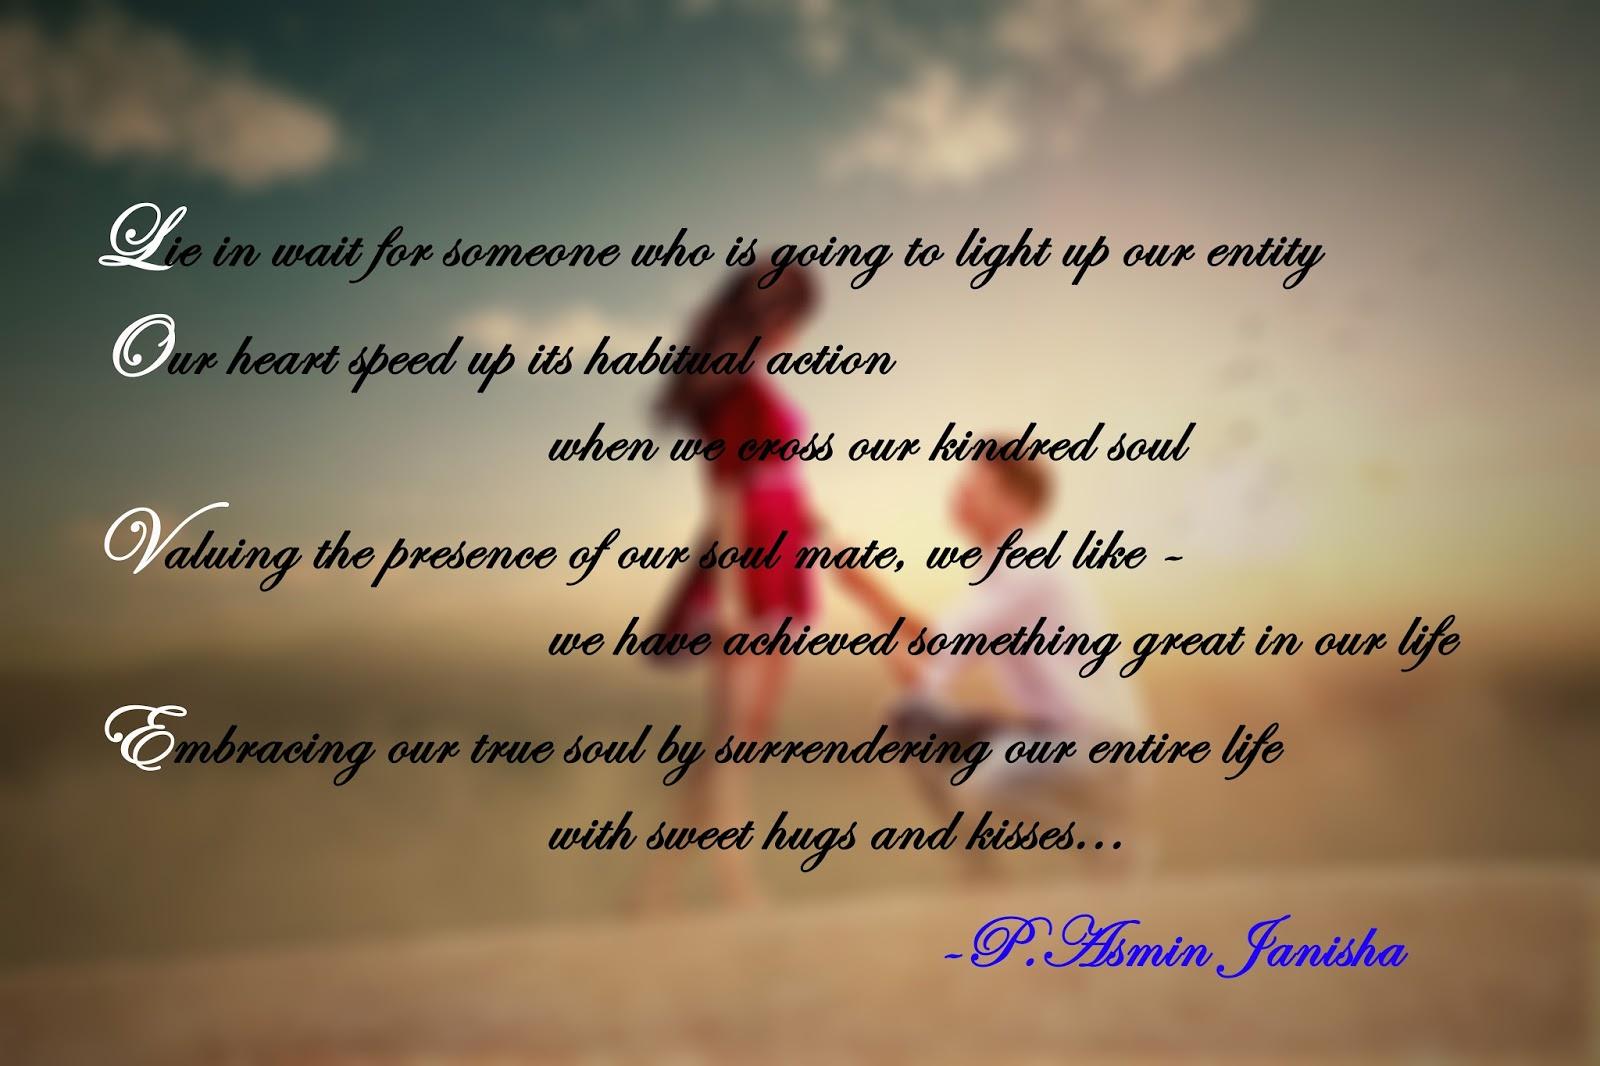 Asmin Janisha